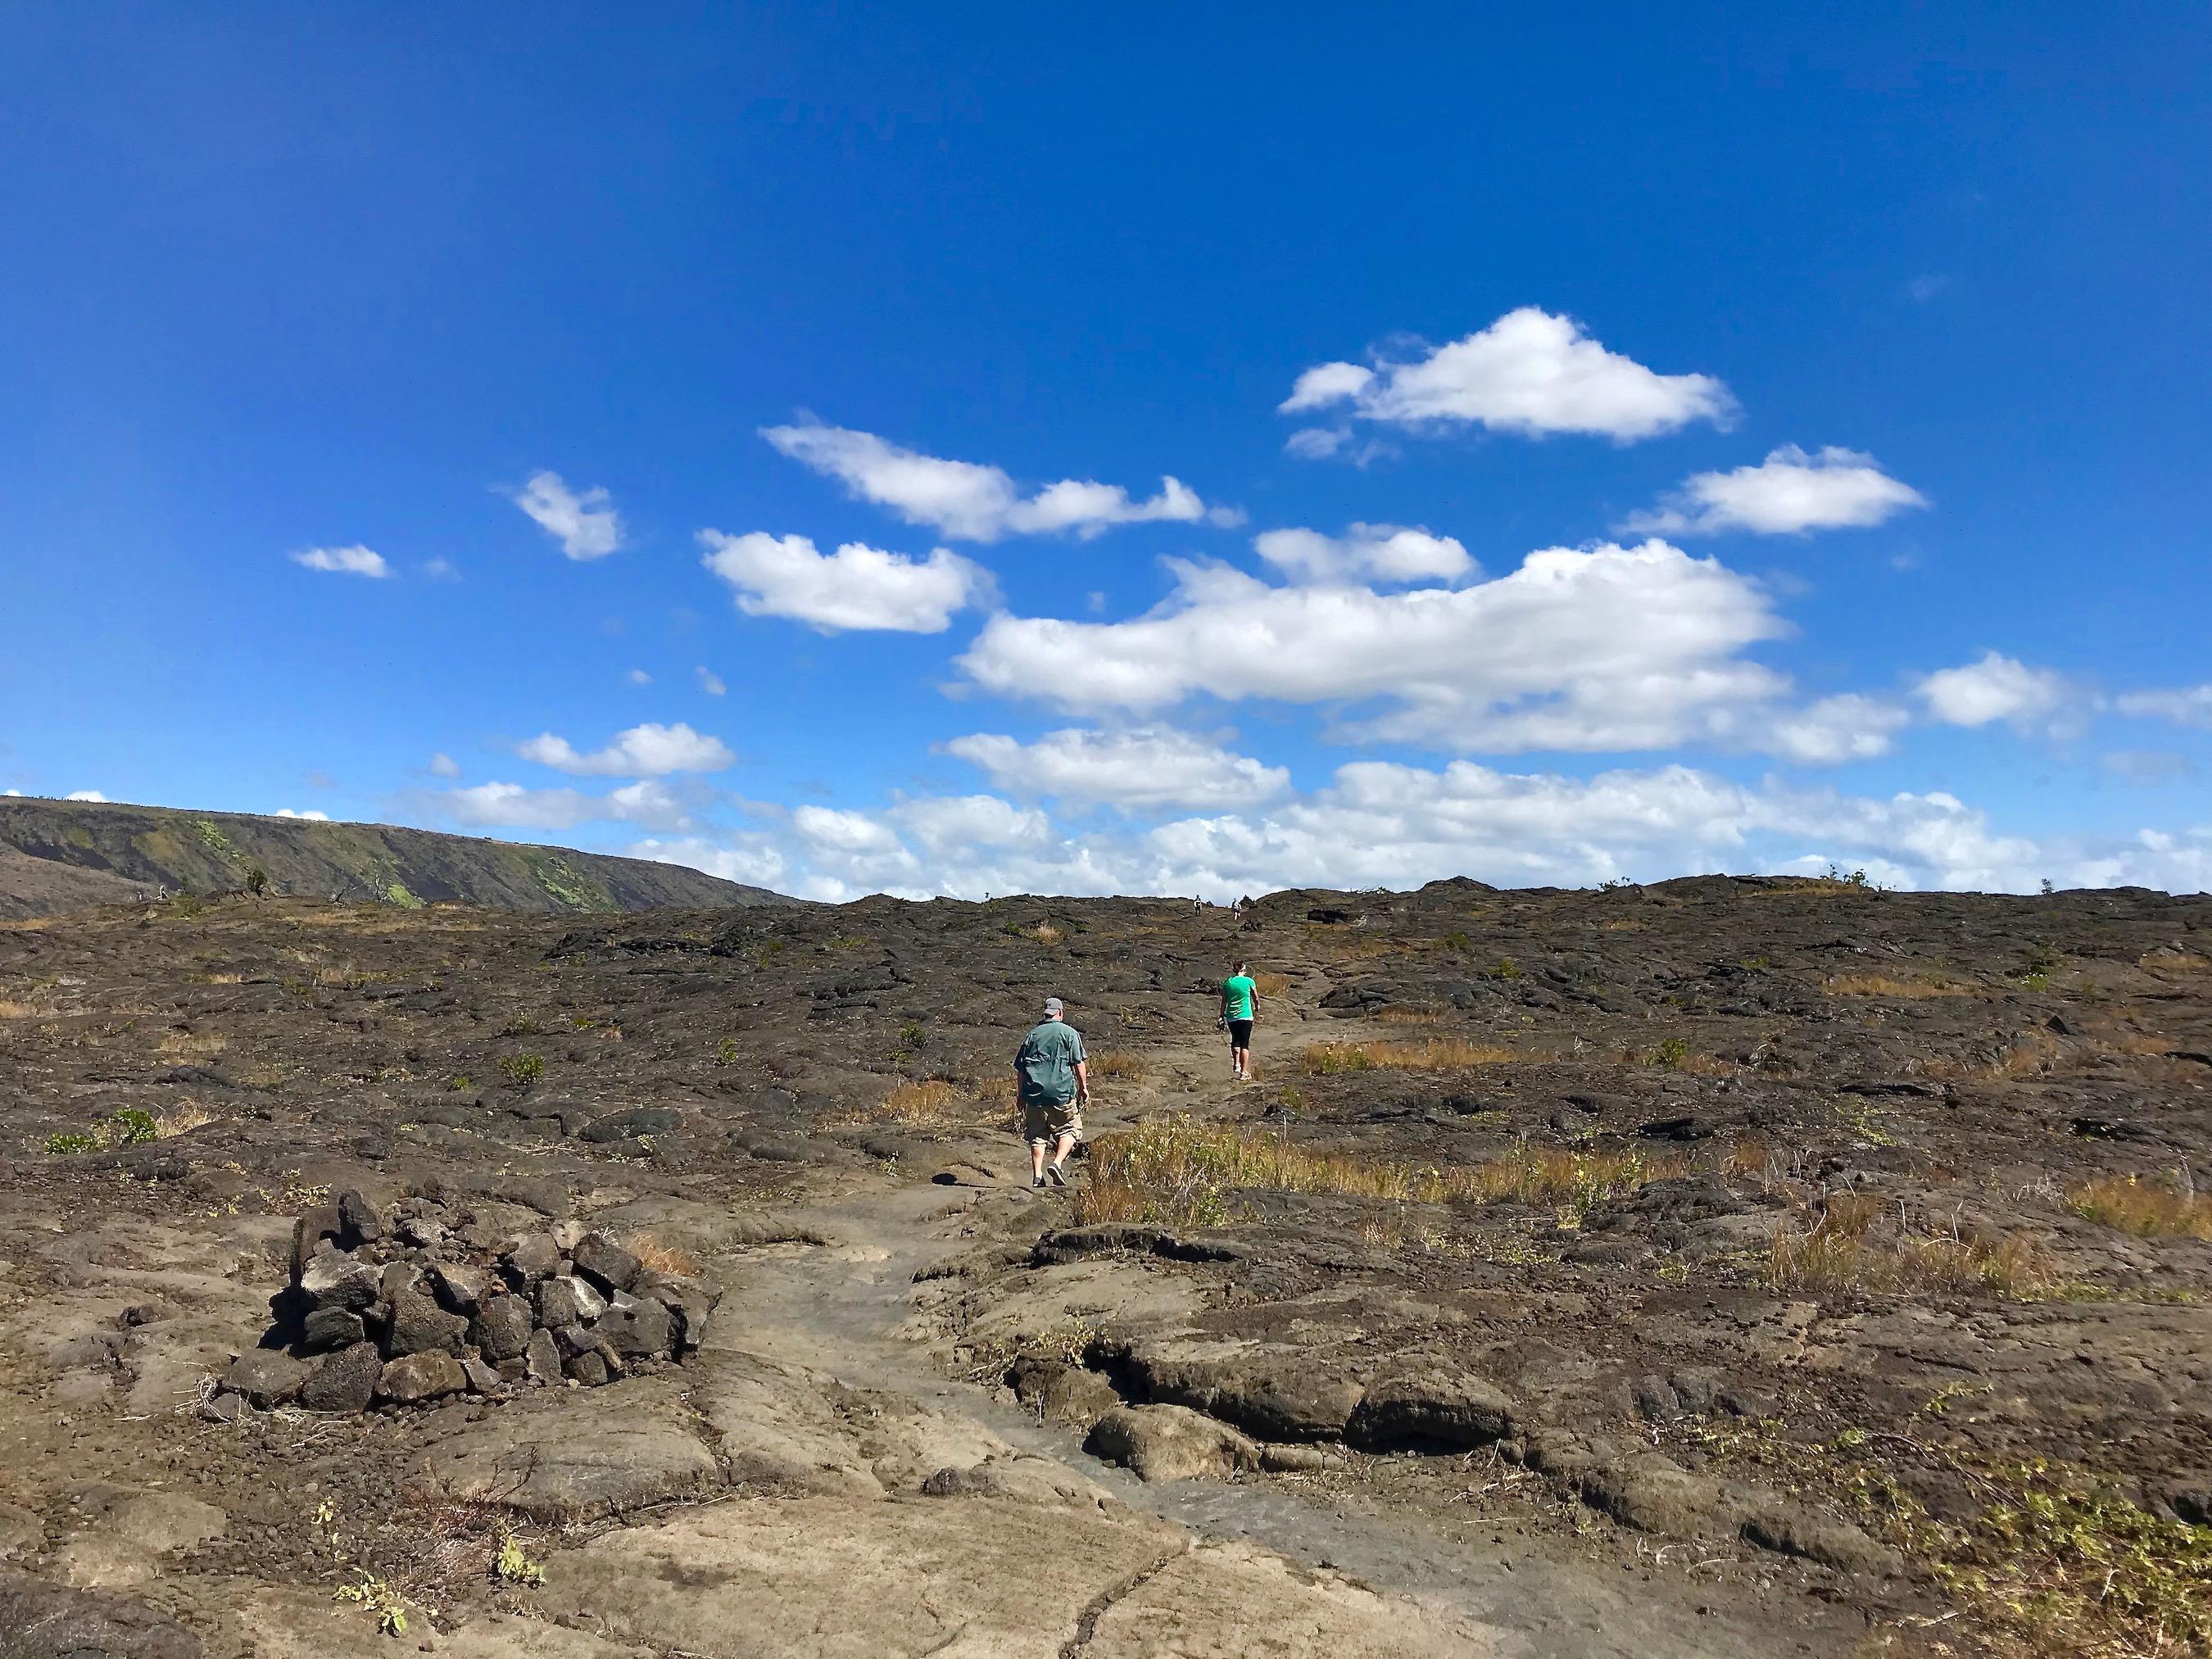 Pu'u Loa Petroglyphs trail